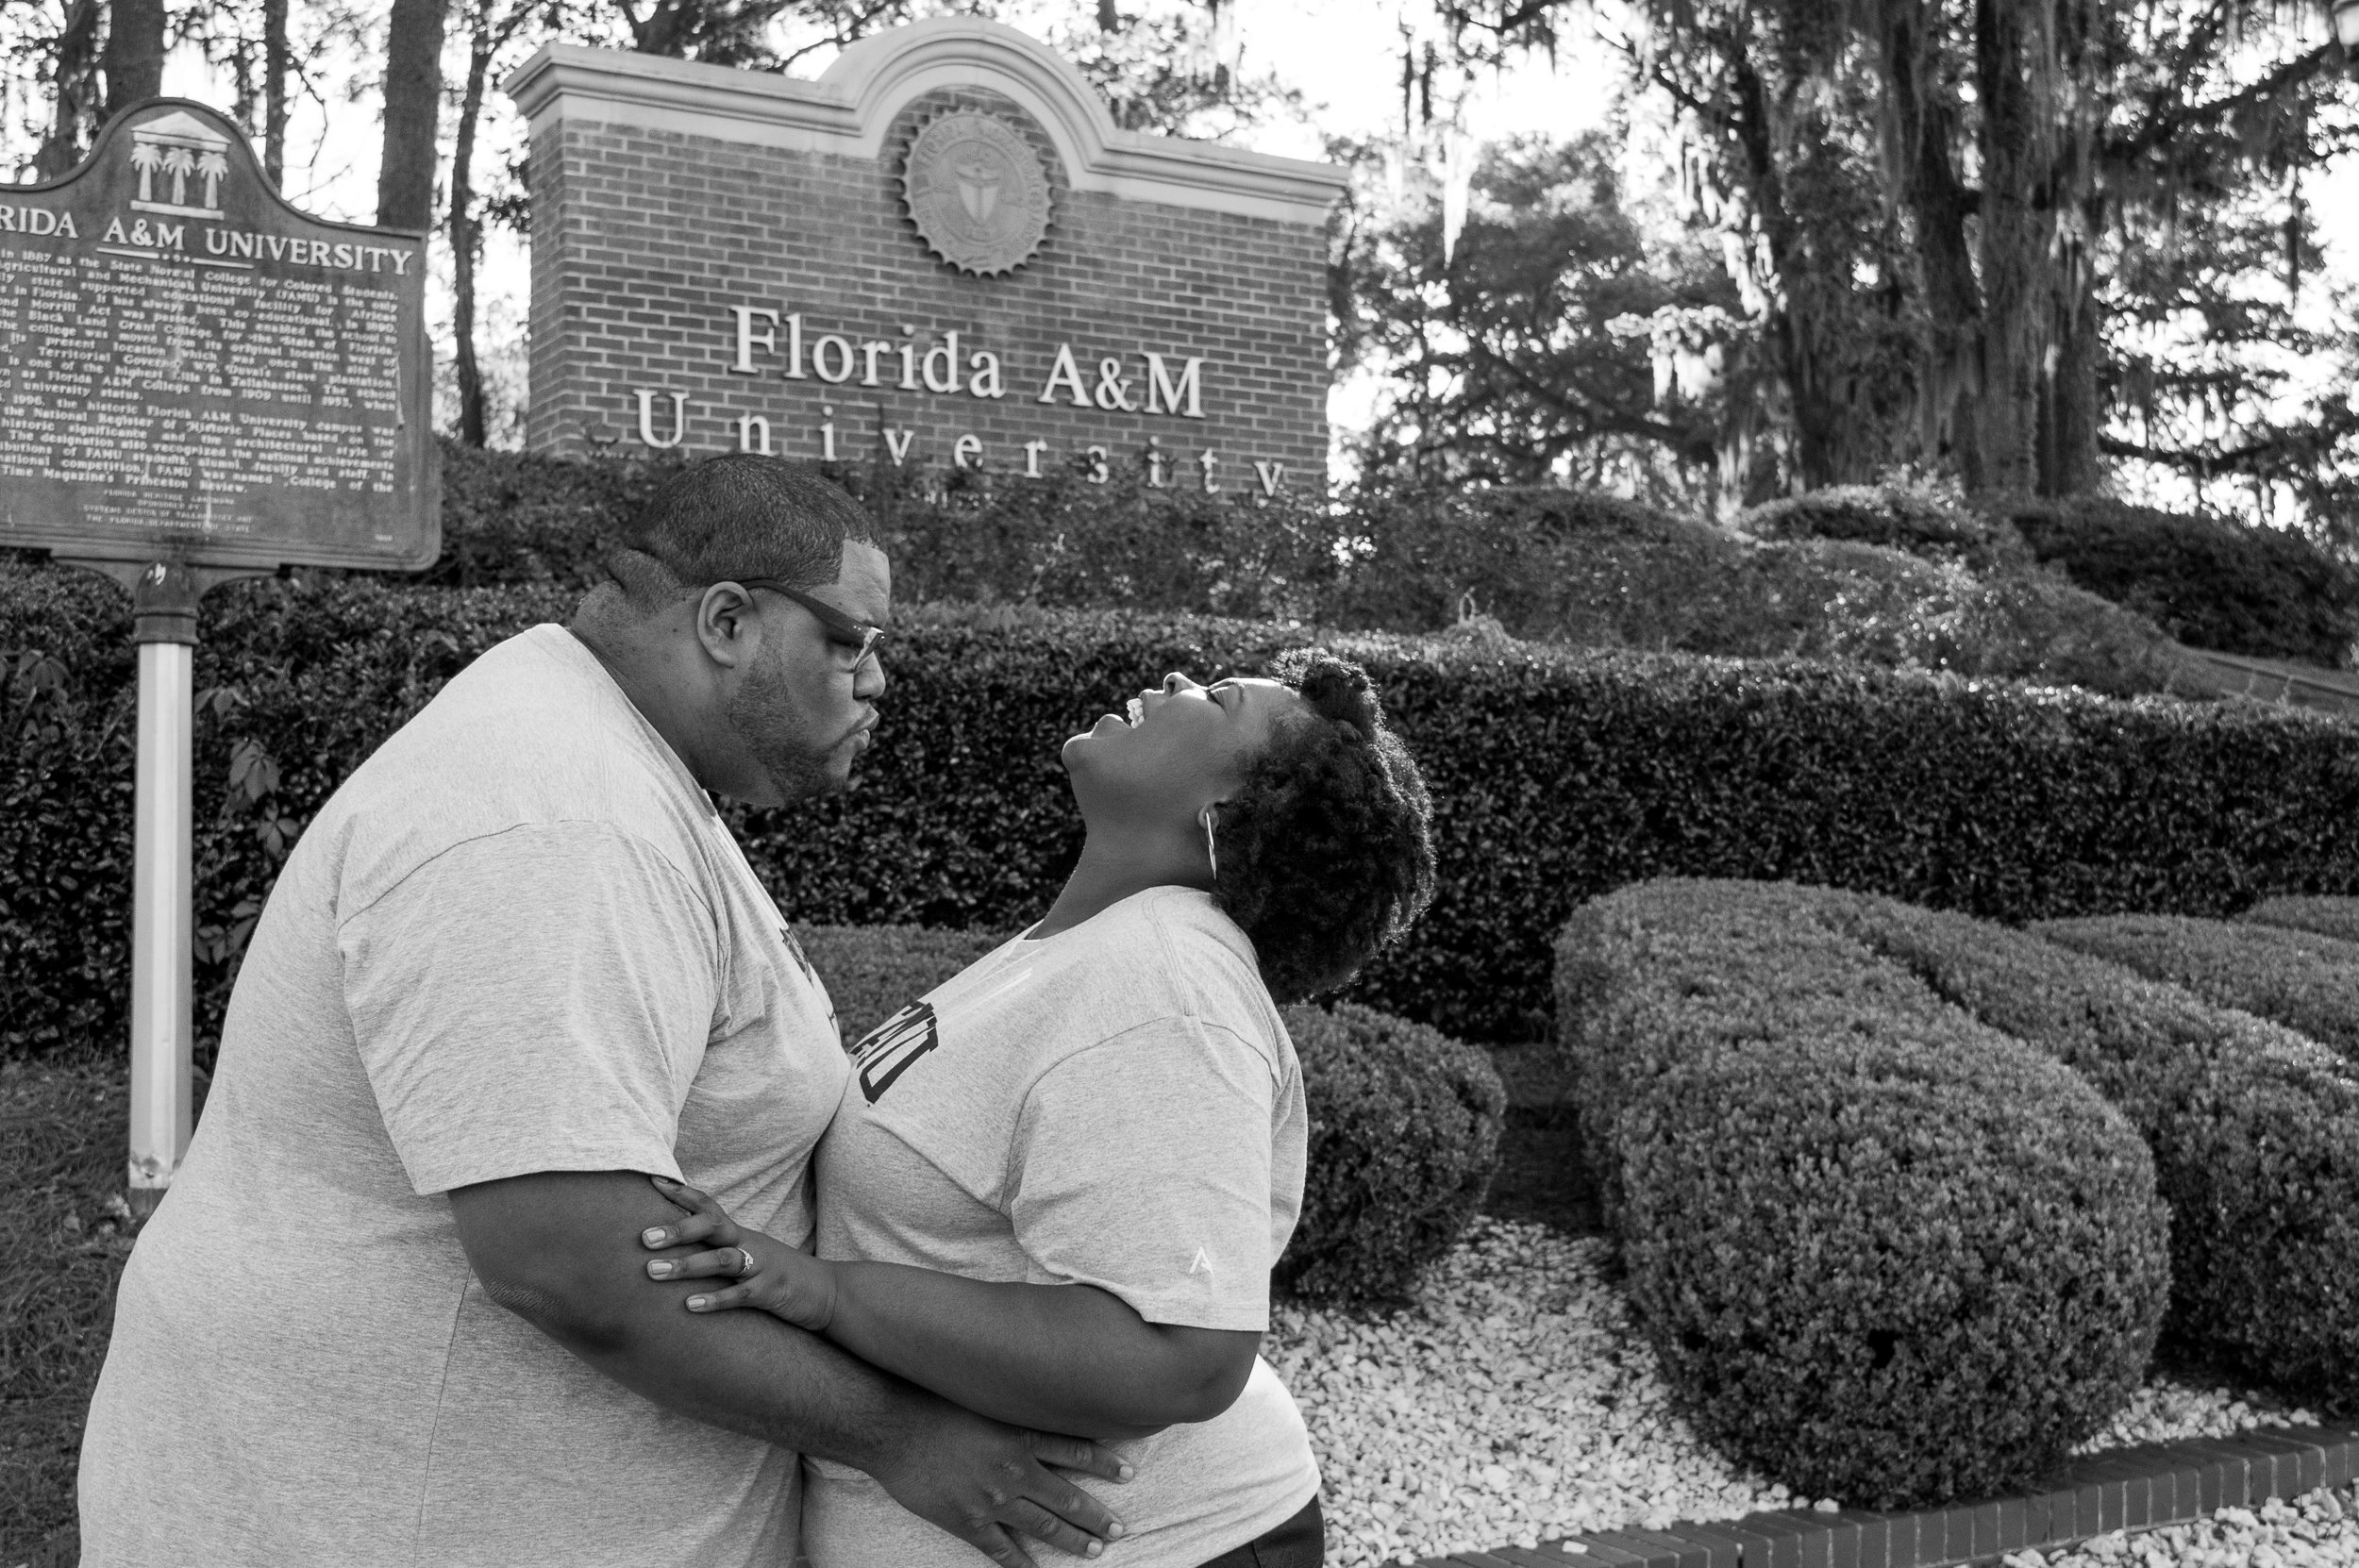 Engagement Session - Florida A&M University